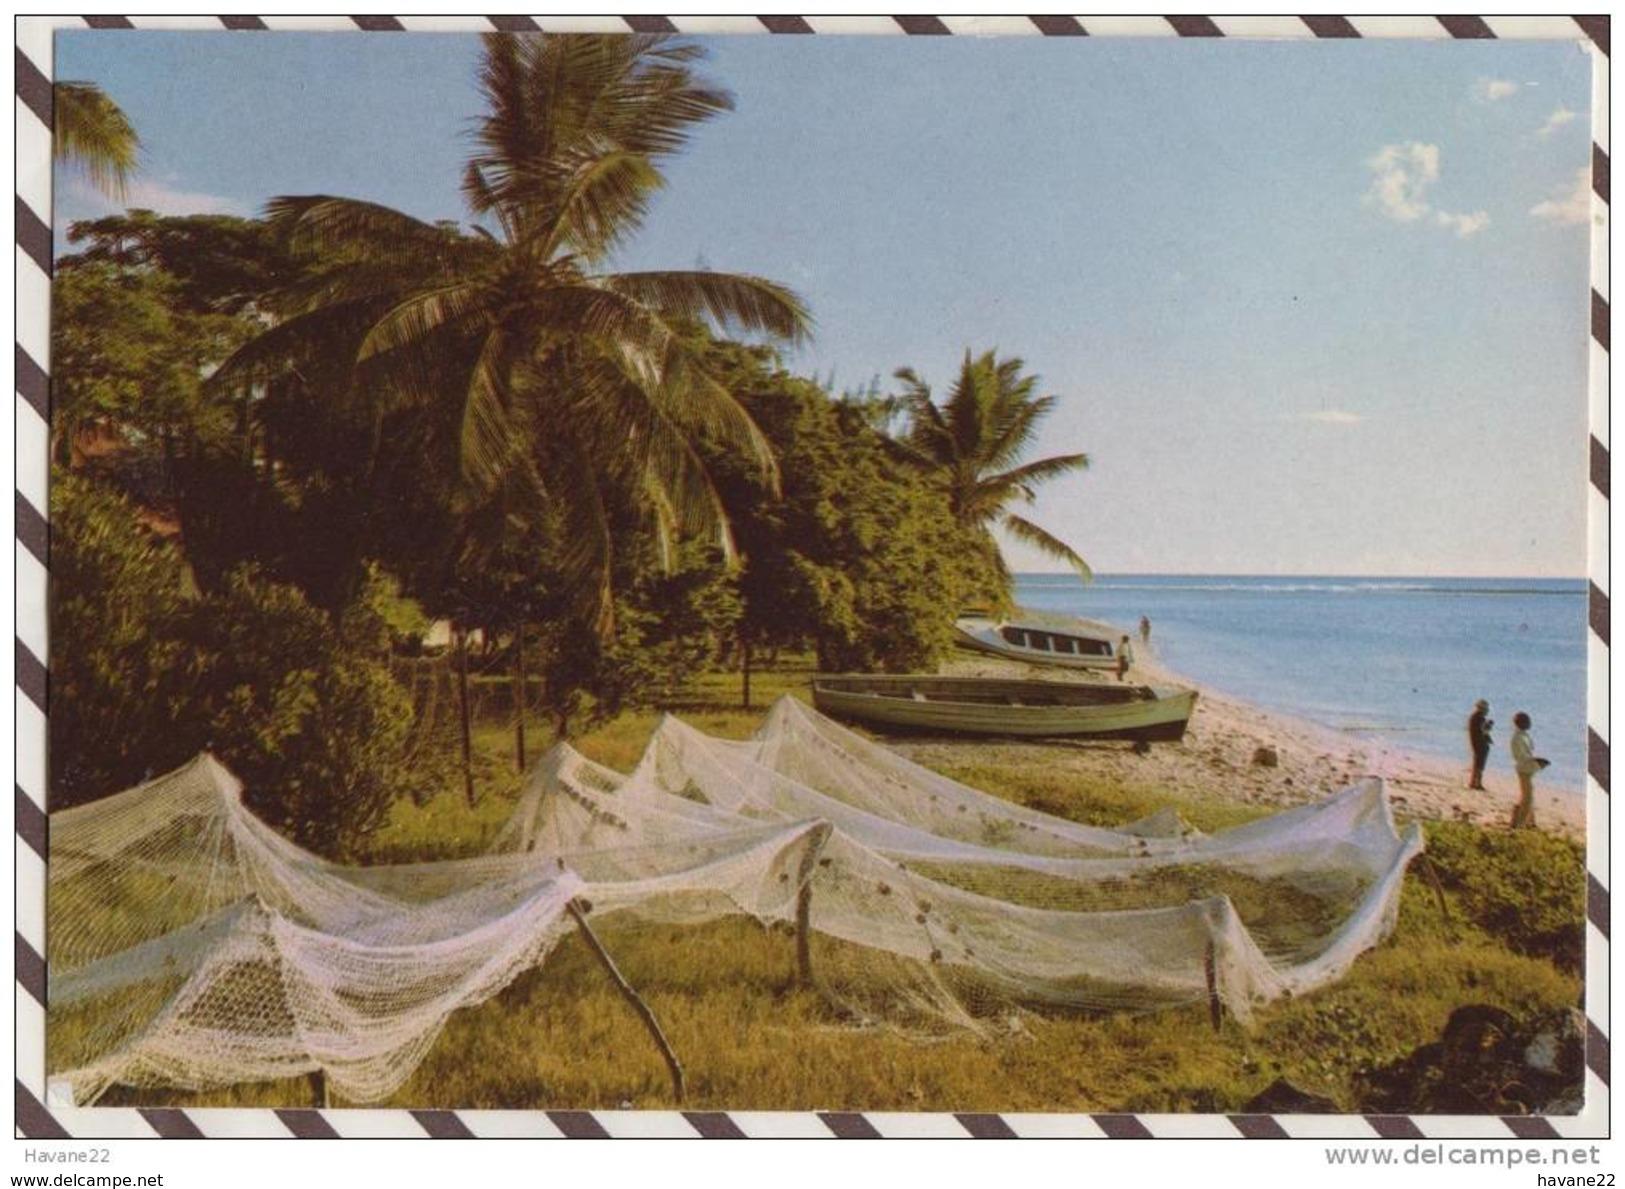 2X2619  MAURITIUS Ile Maurice Vue De La Cote TAMARIN - Mauritius